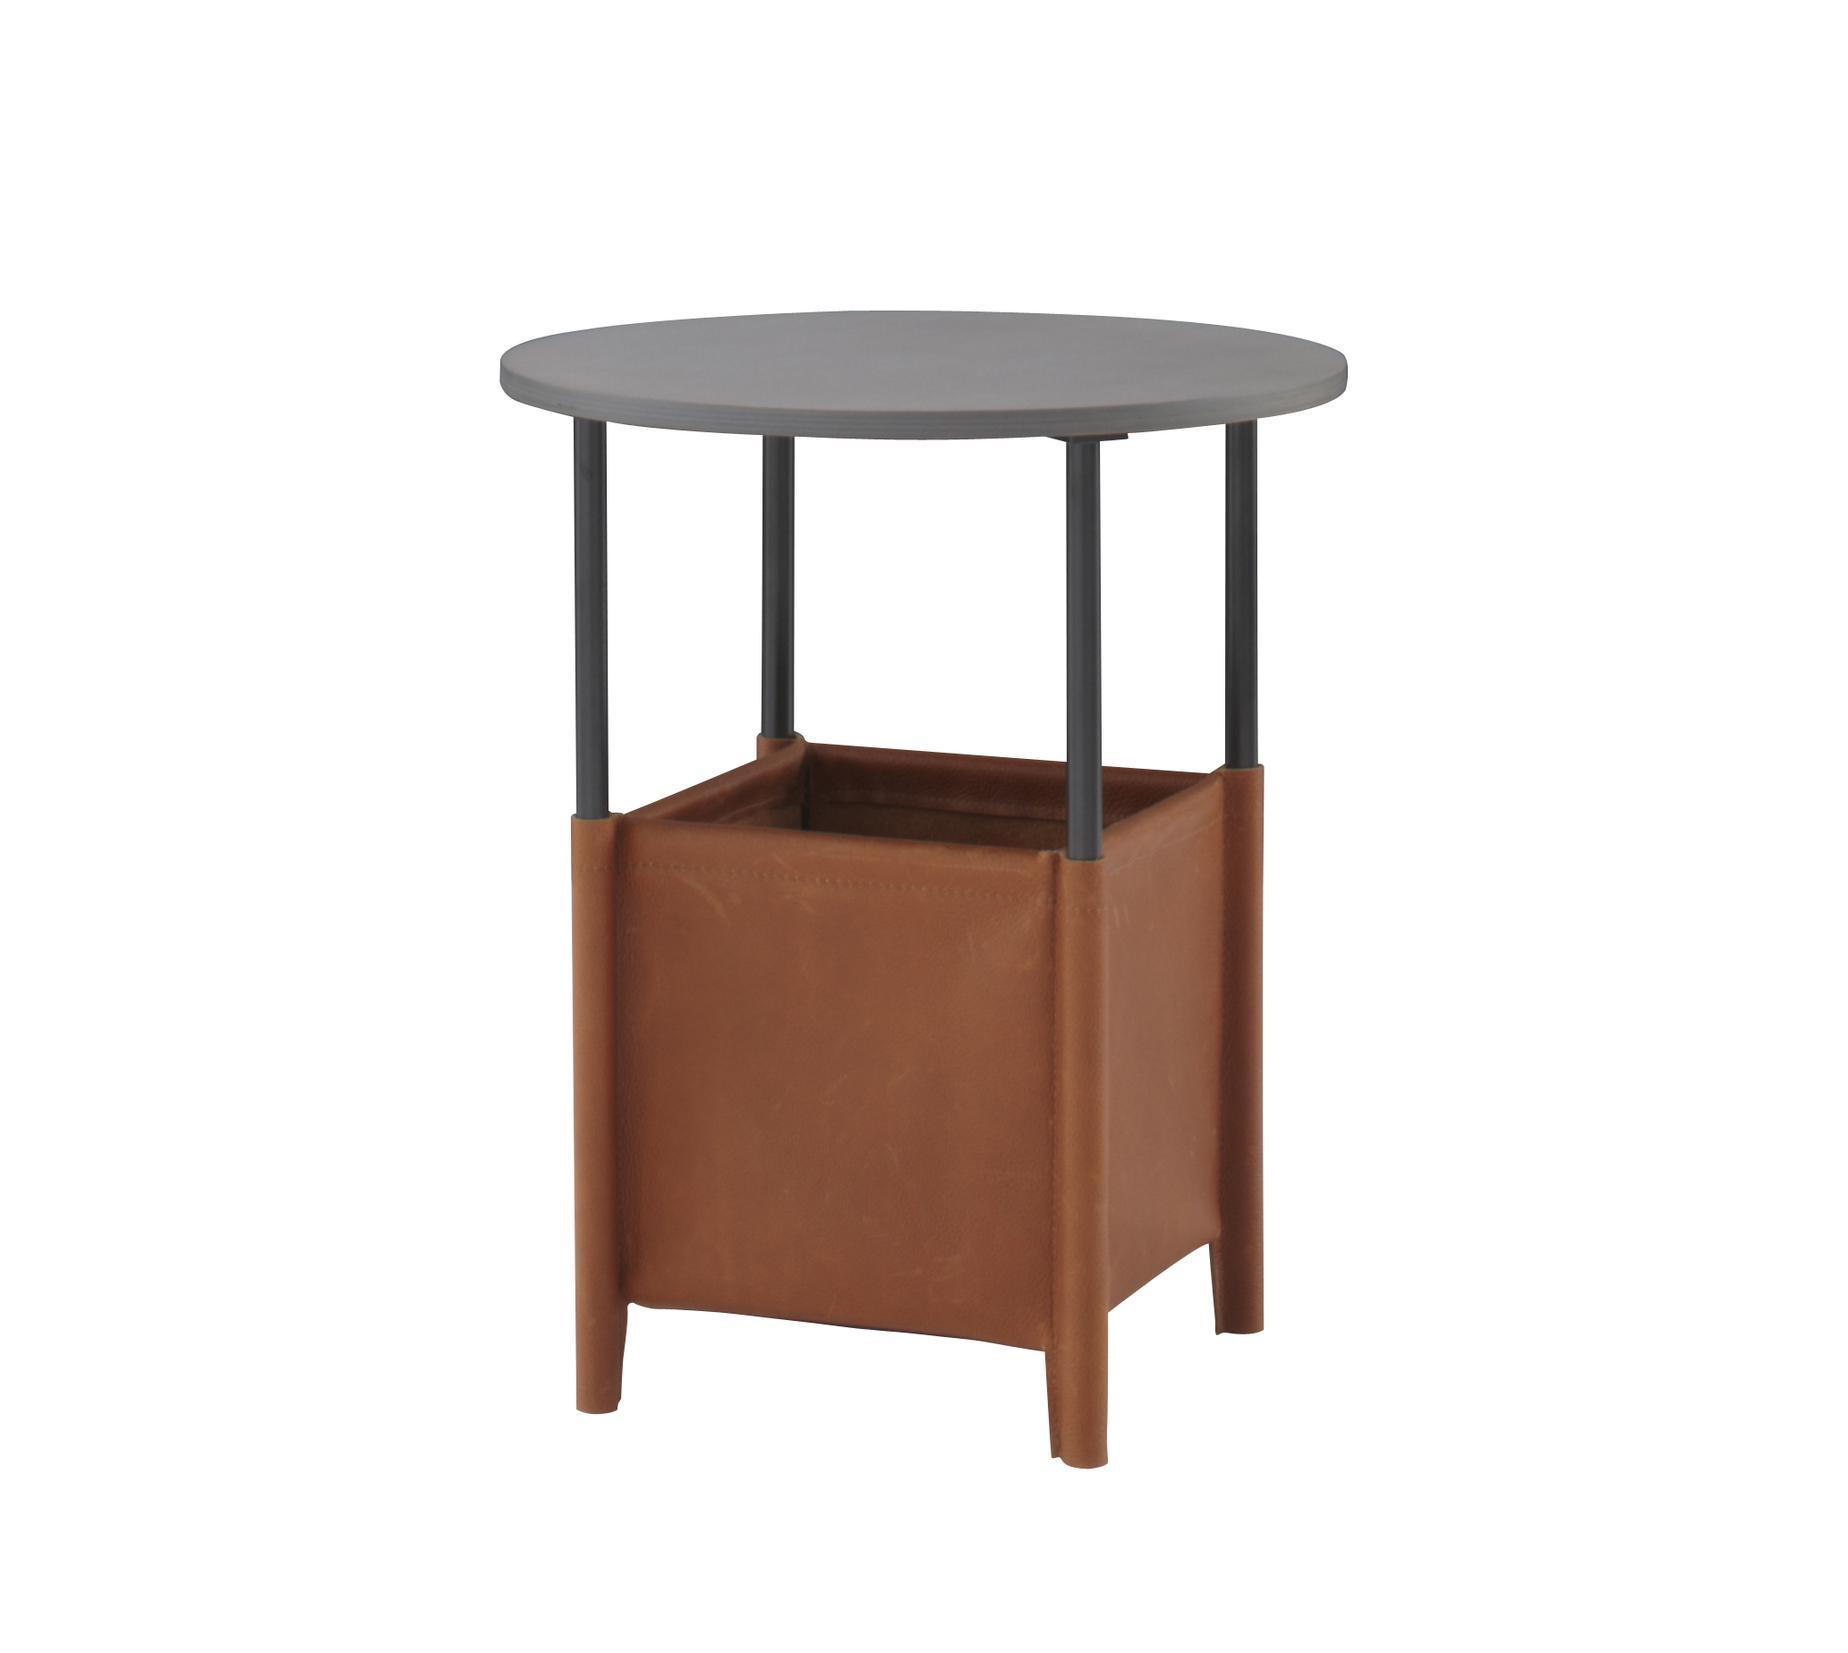 ruch nachttisch designer inga semp ligne roset. Black Bedroom Furniture Sets. Home Design Ideas